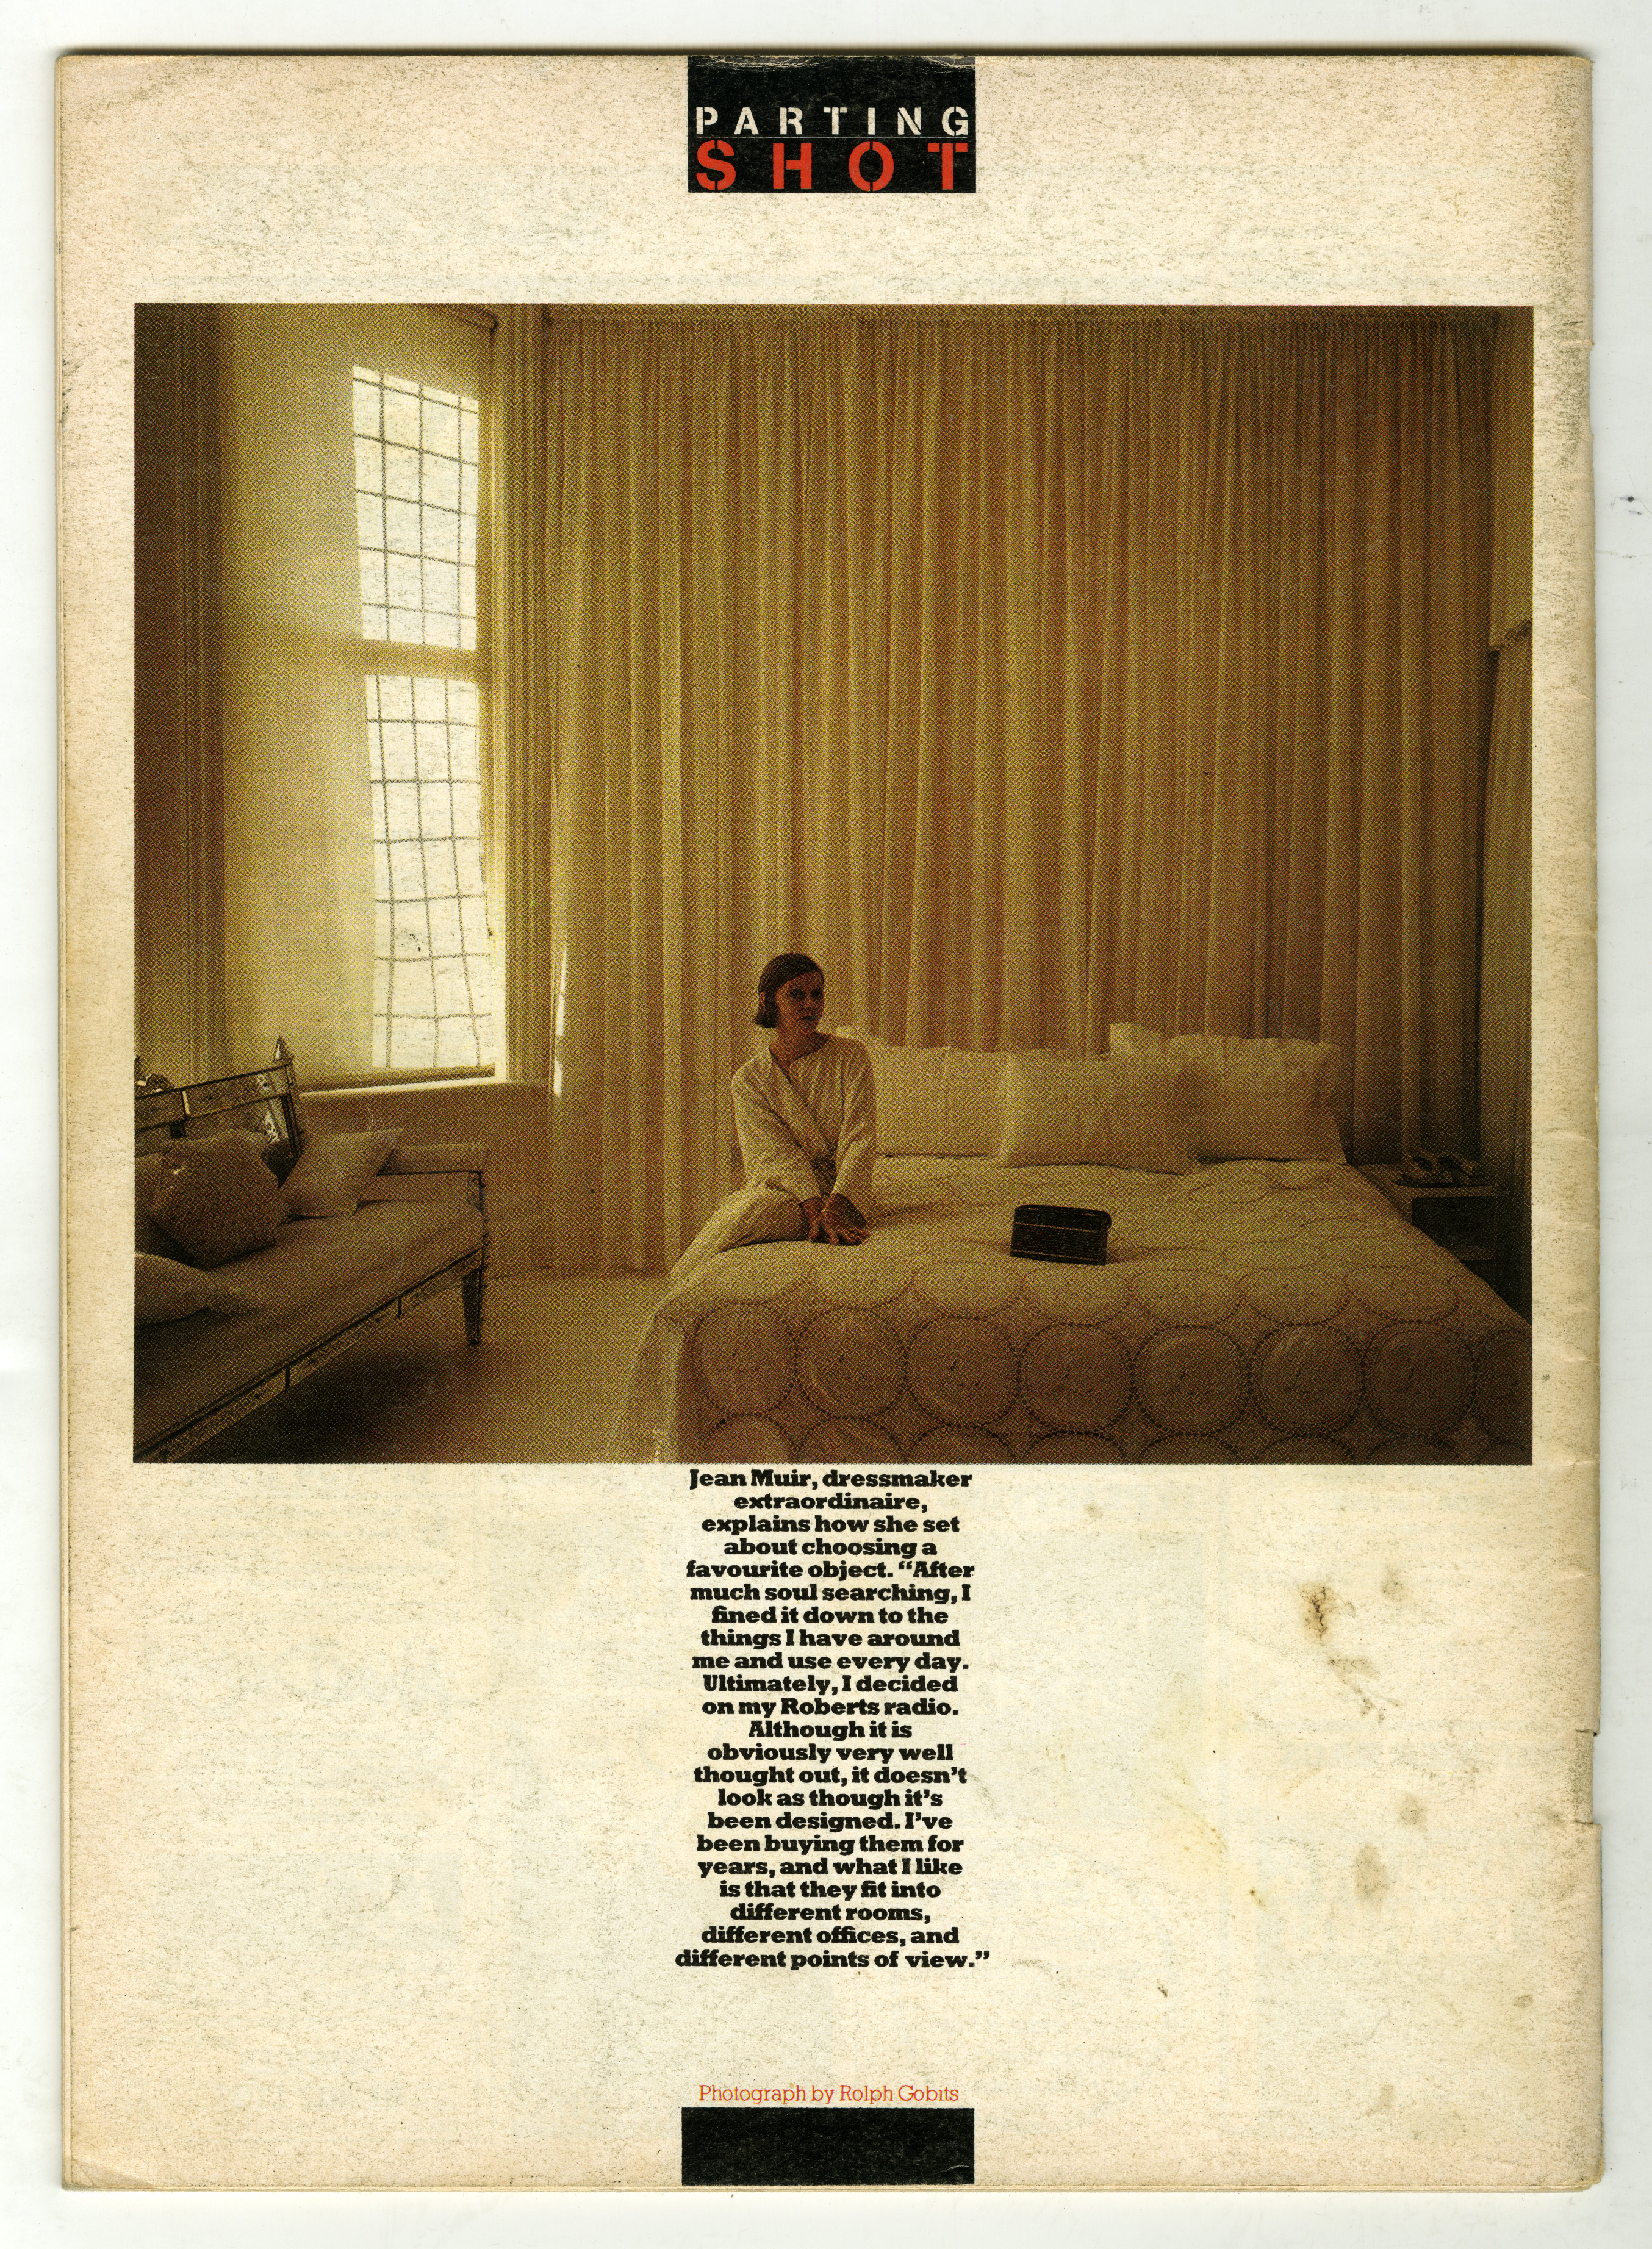 Rolph Gobits, Jean Muir, Direction Magazine-01